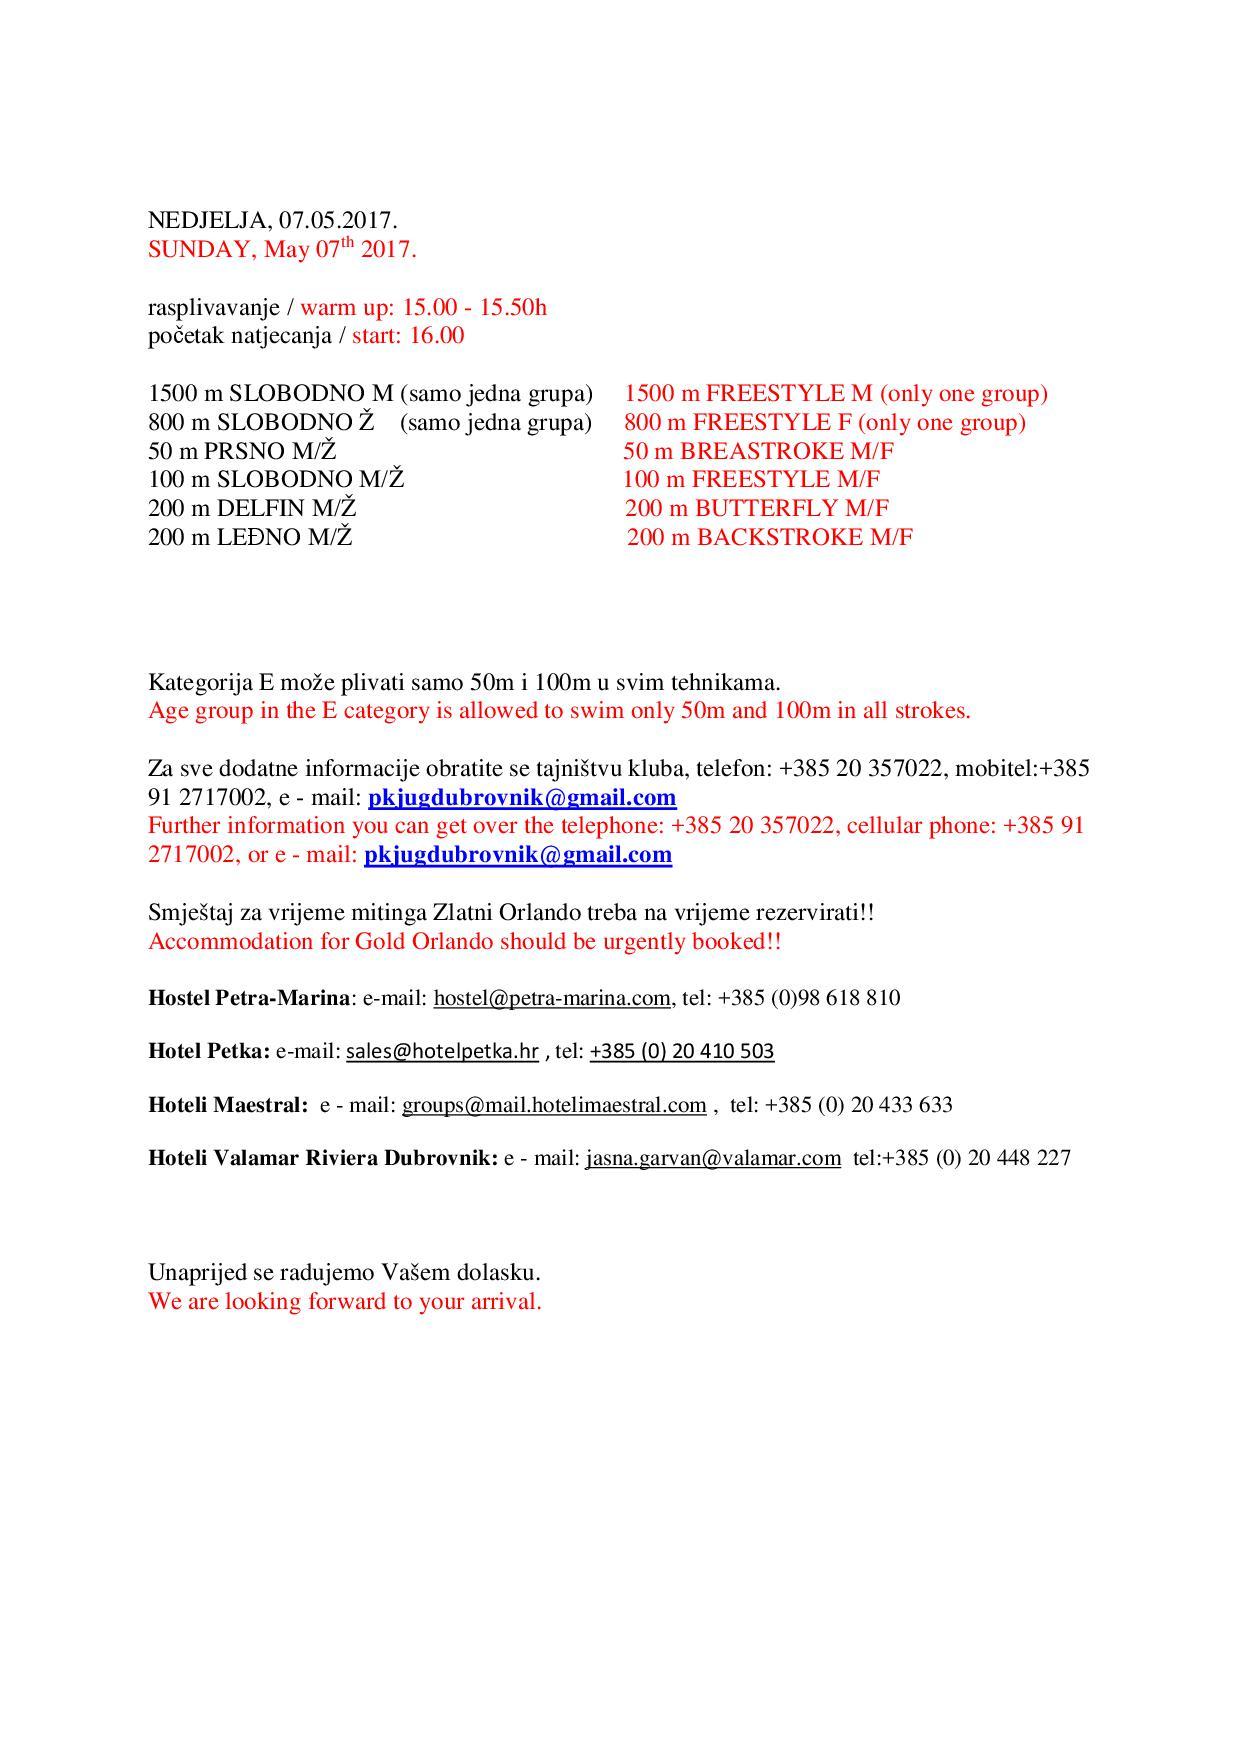 Original proposition of organizer, Page 4